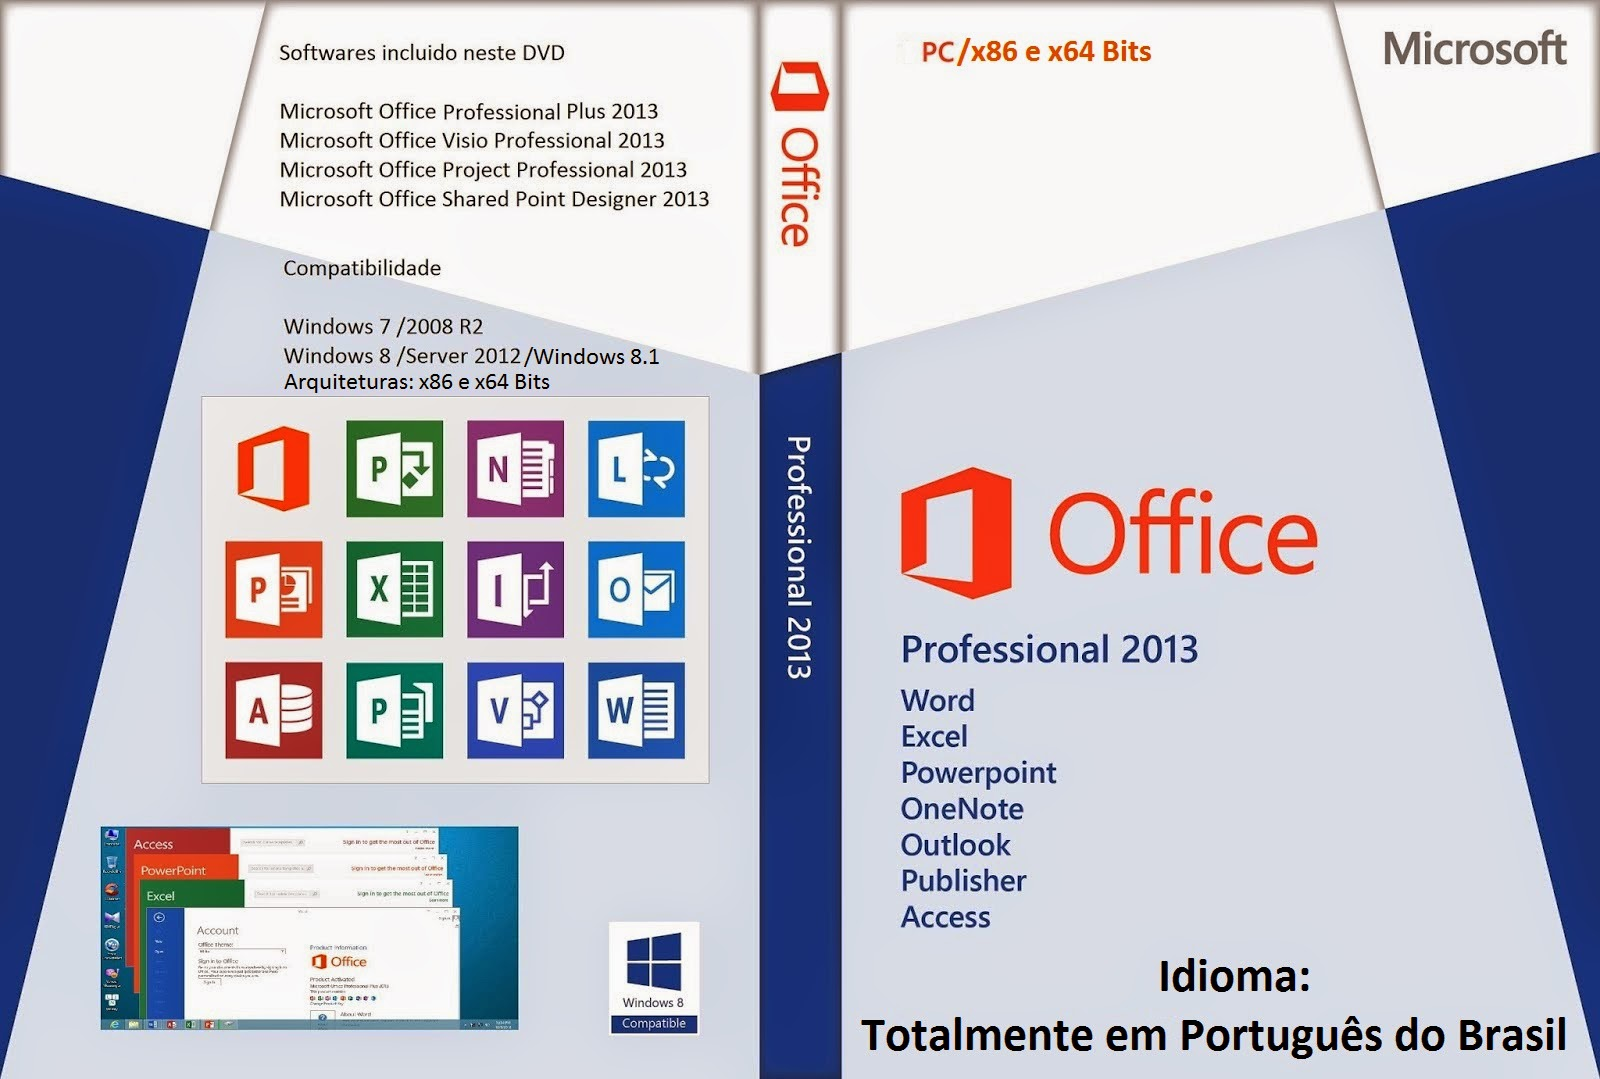 microsoft office professional 2013 encountered an error